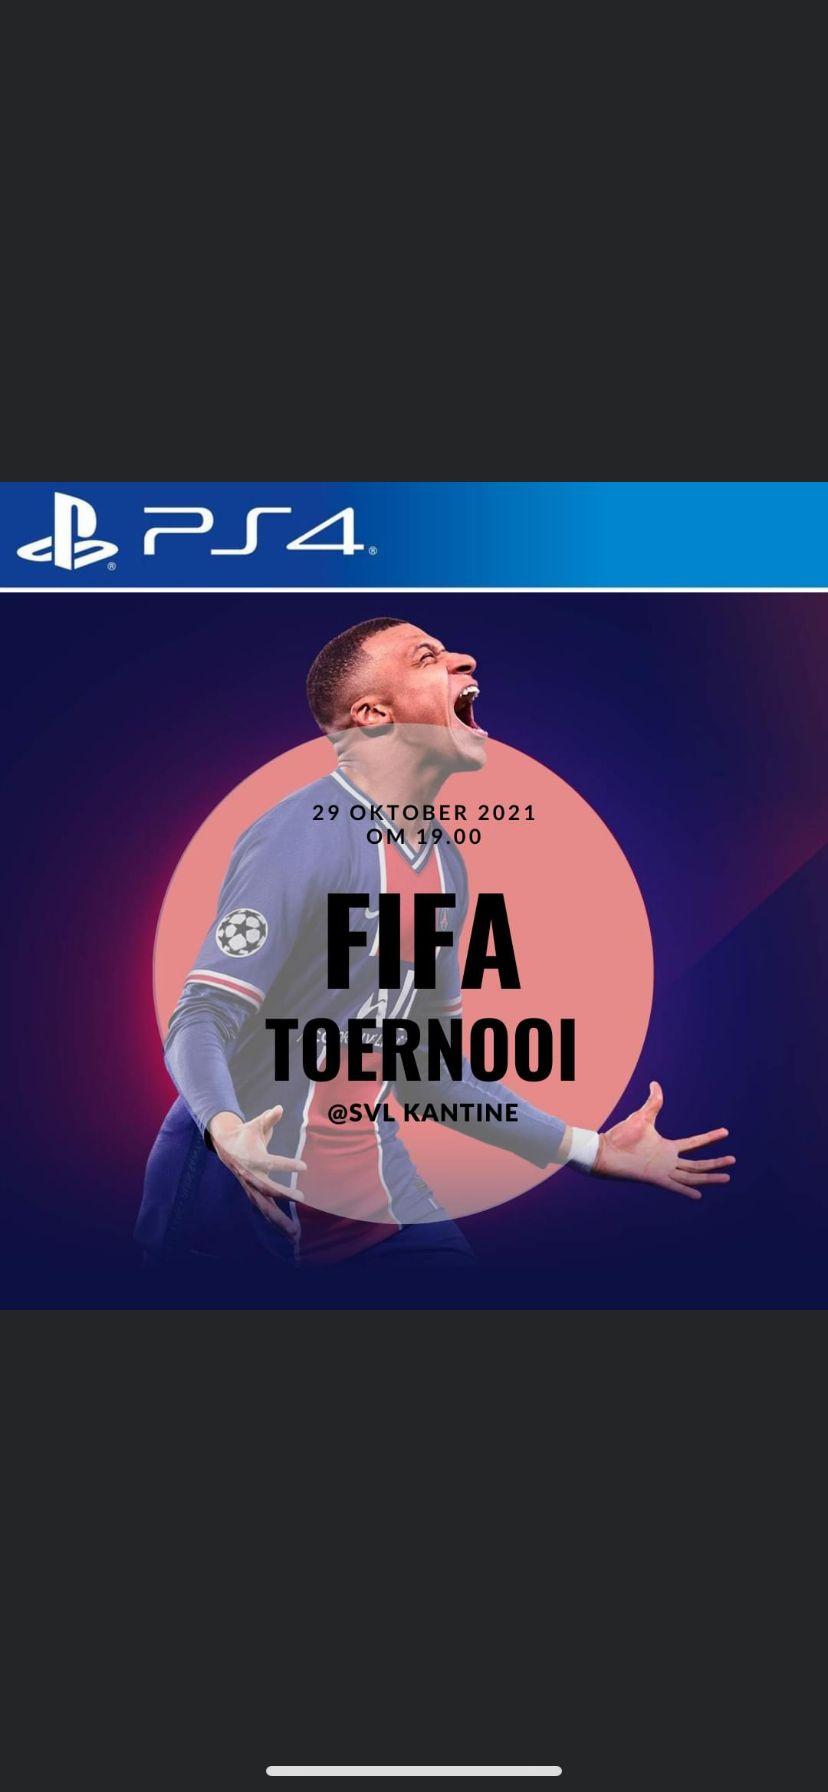 FIFA toernooi SVL